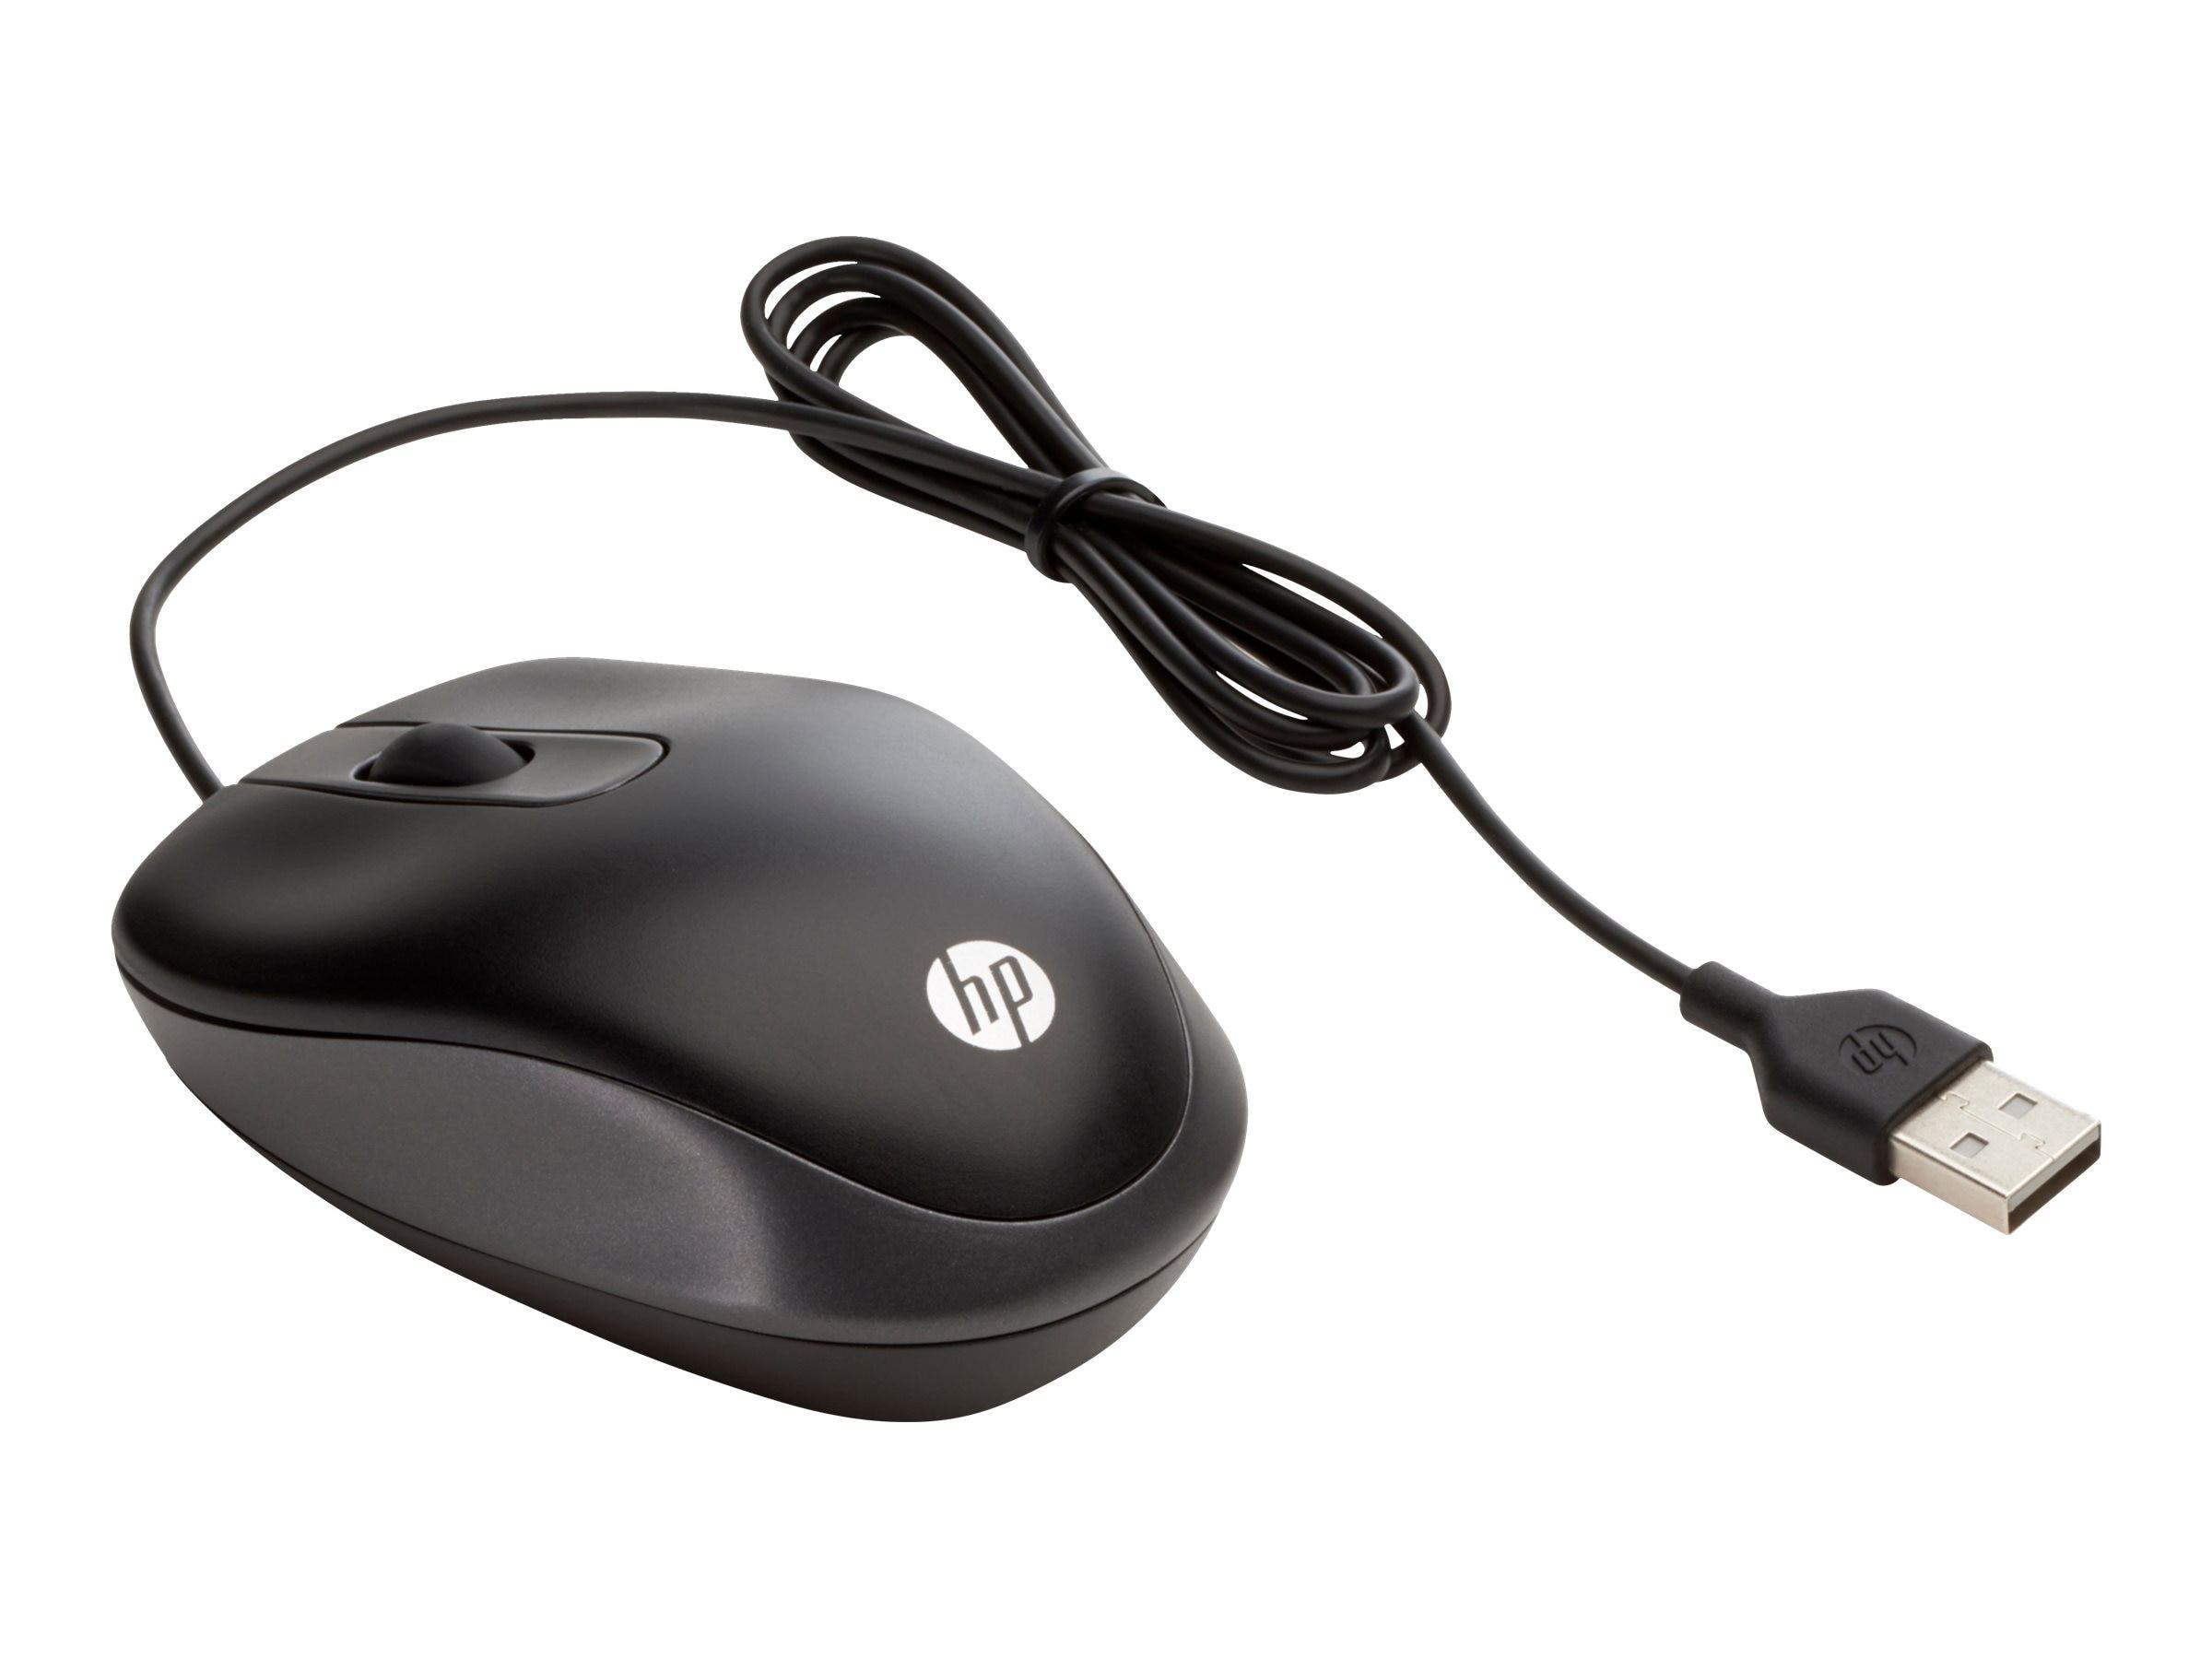 HP USB Travel Mouse (G1K28AA#ABA)